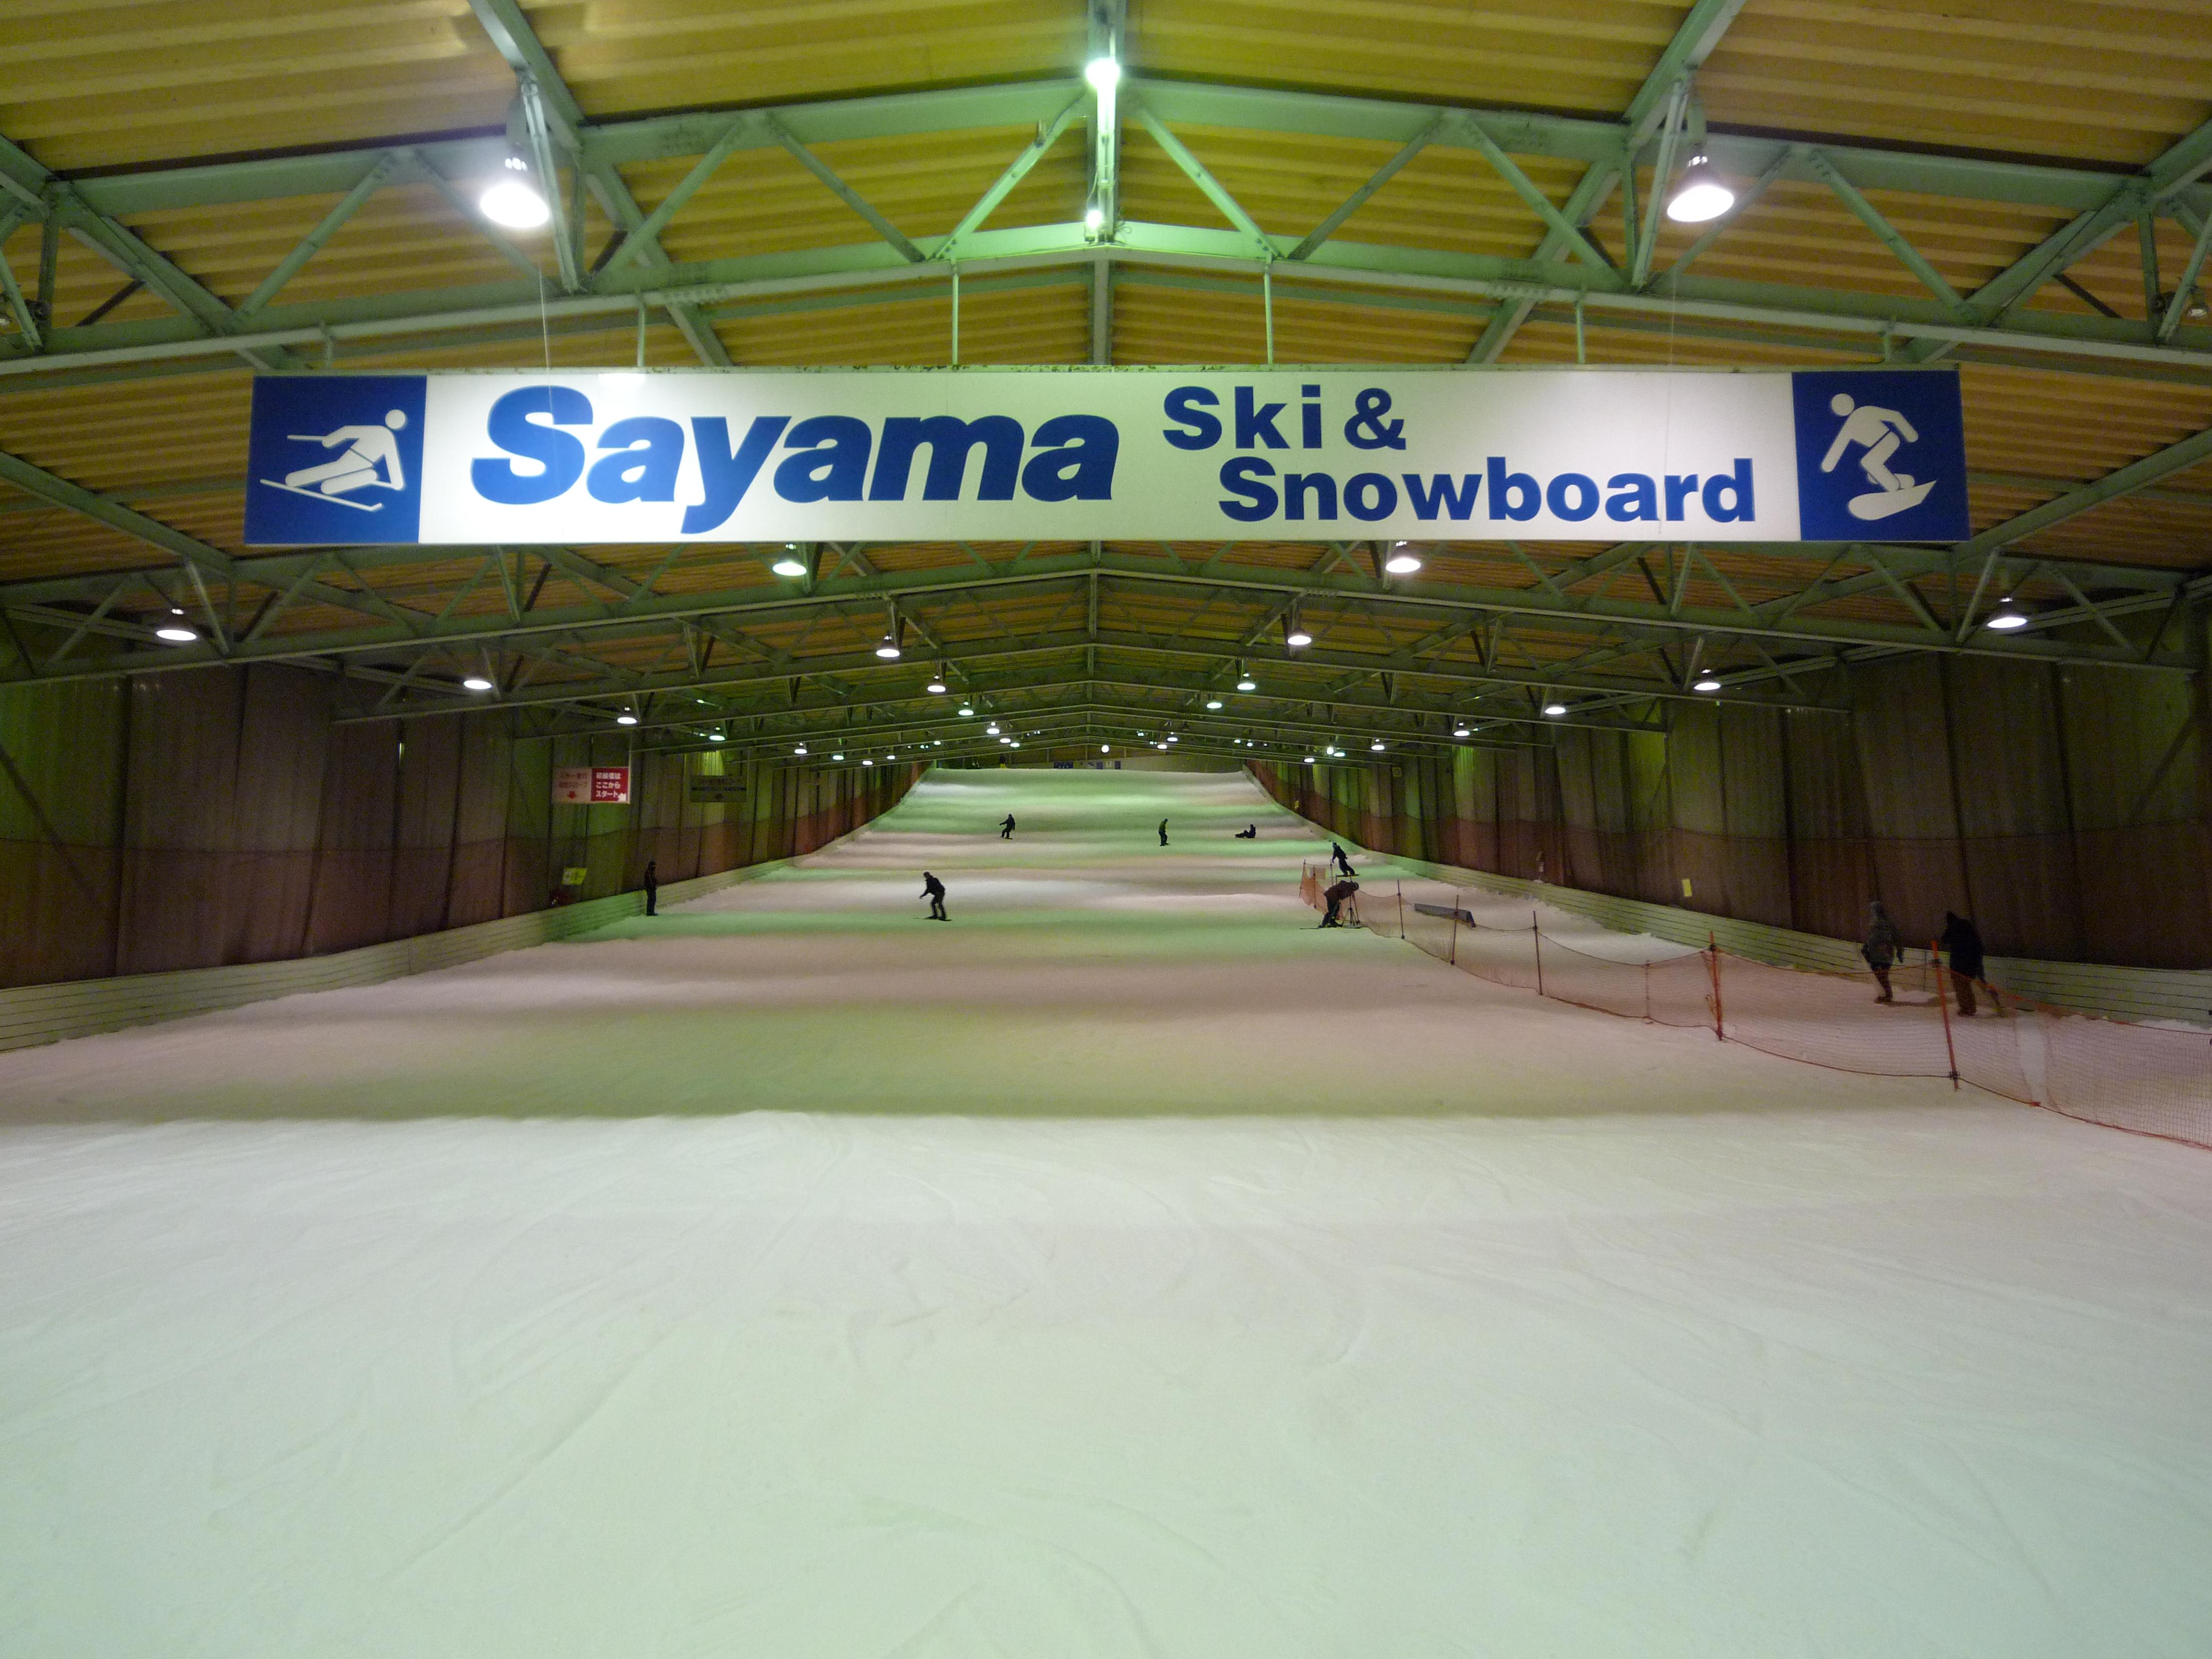 file:prince snow resort sayama - wikimedia commons